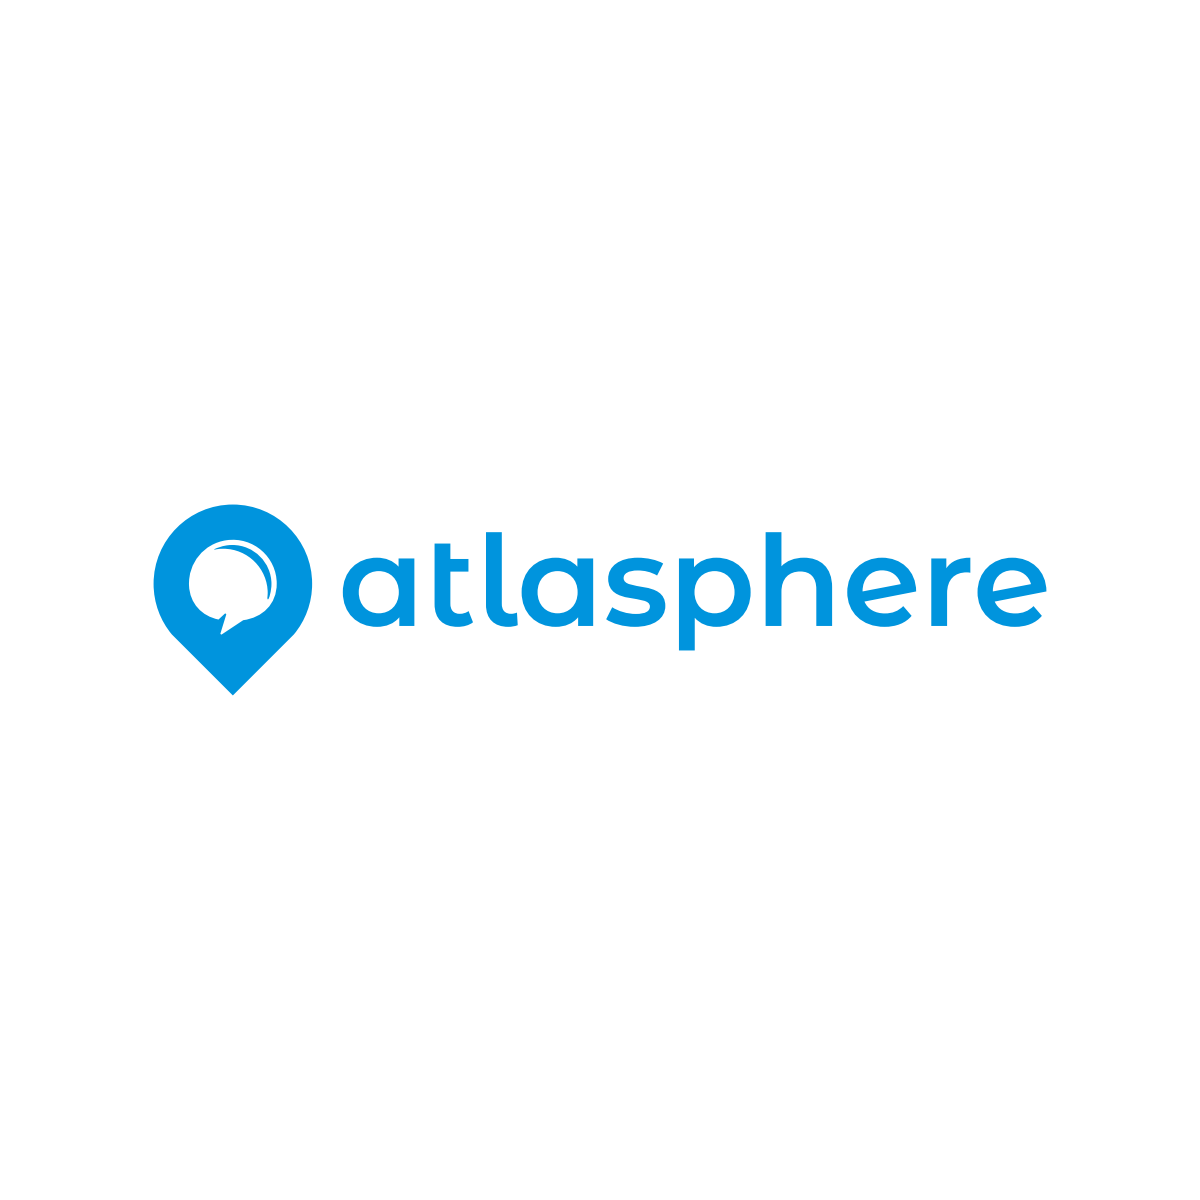 Atlasphere Logo Design